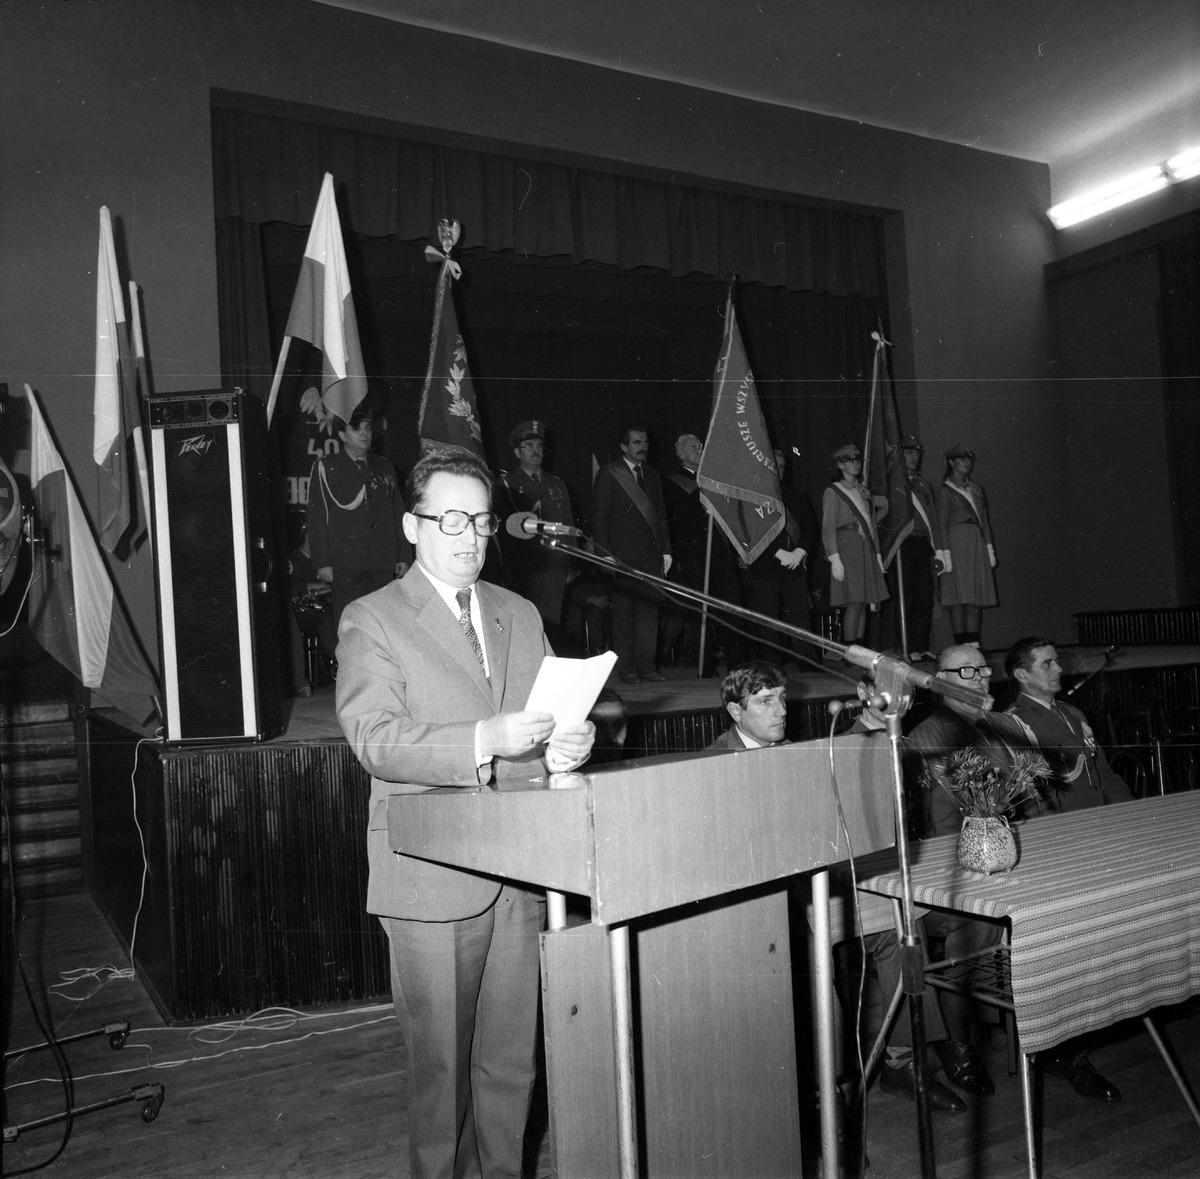 40-lecie PRL, 1984 r.